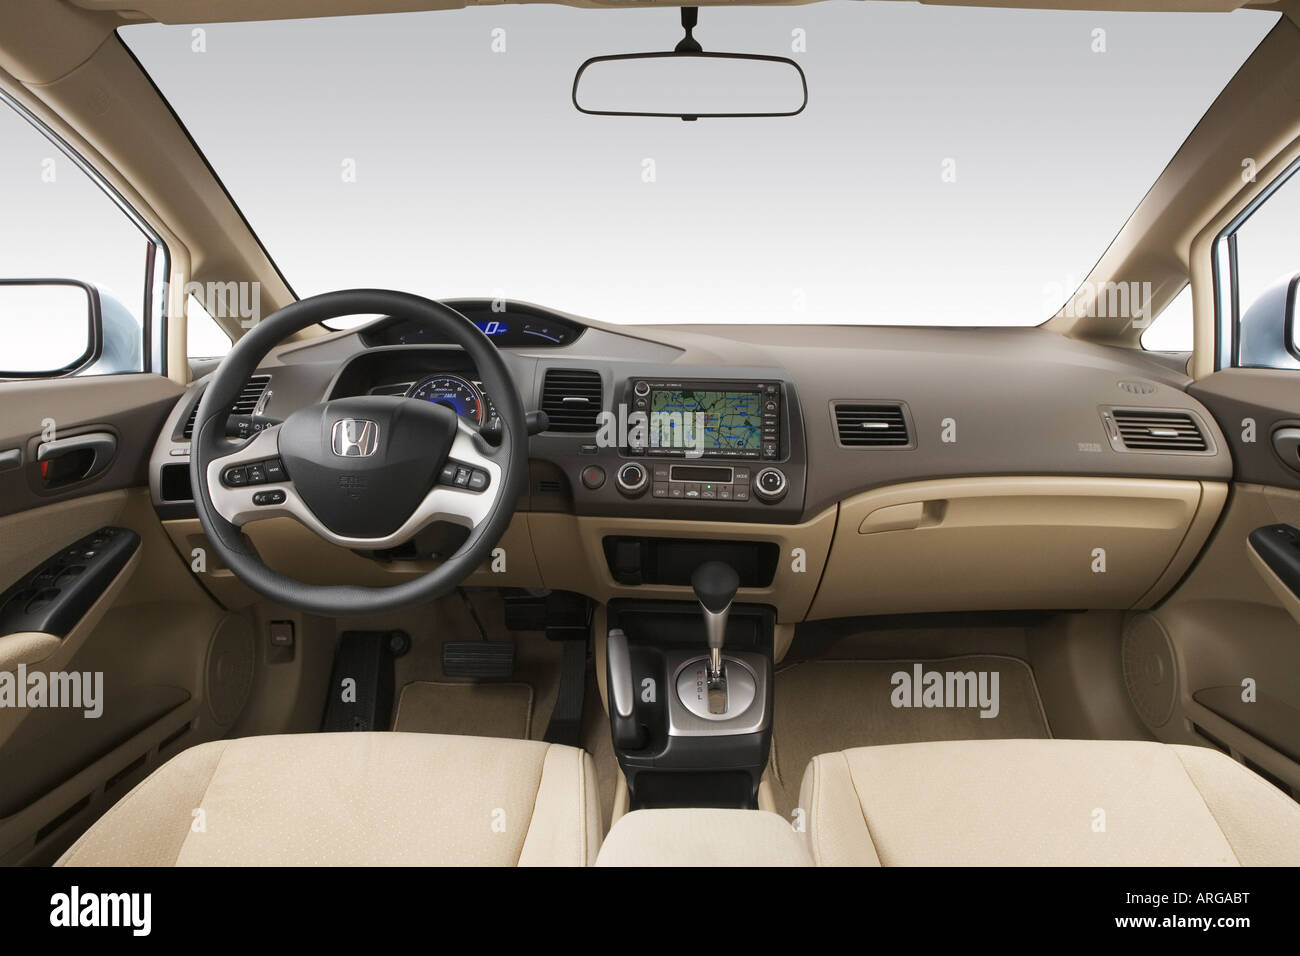 2007 Honda Civic Hybrid In Blue   Dashboard, Center Console, Gear Shifter  View